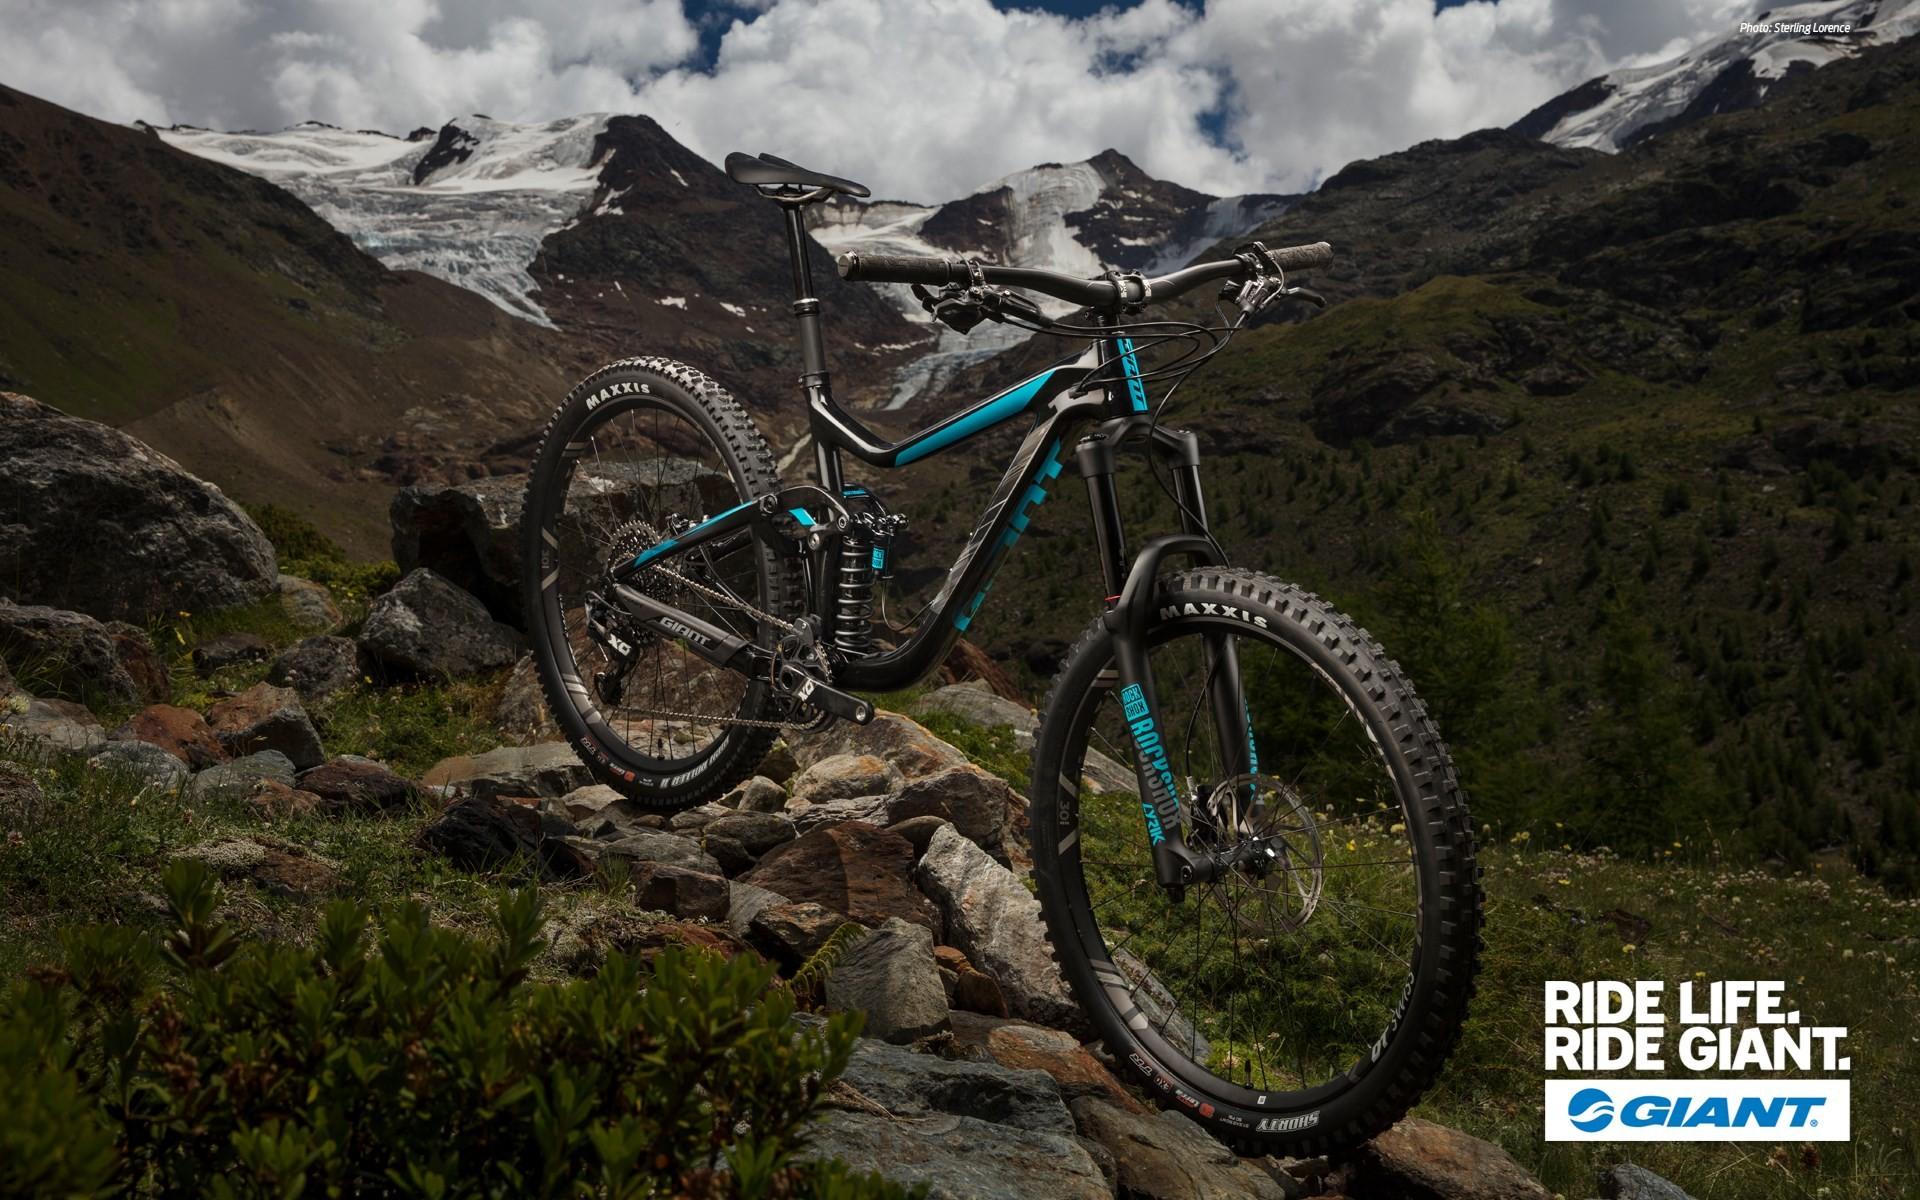 Downhill Mountain Bike 2018 Wallpapers Wallpapertag